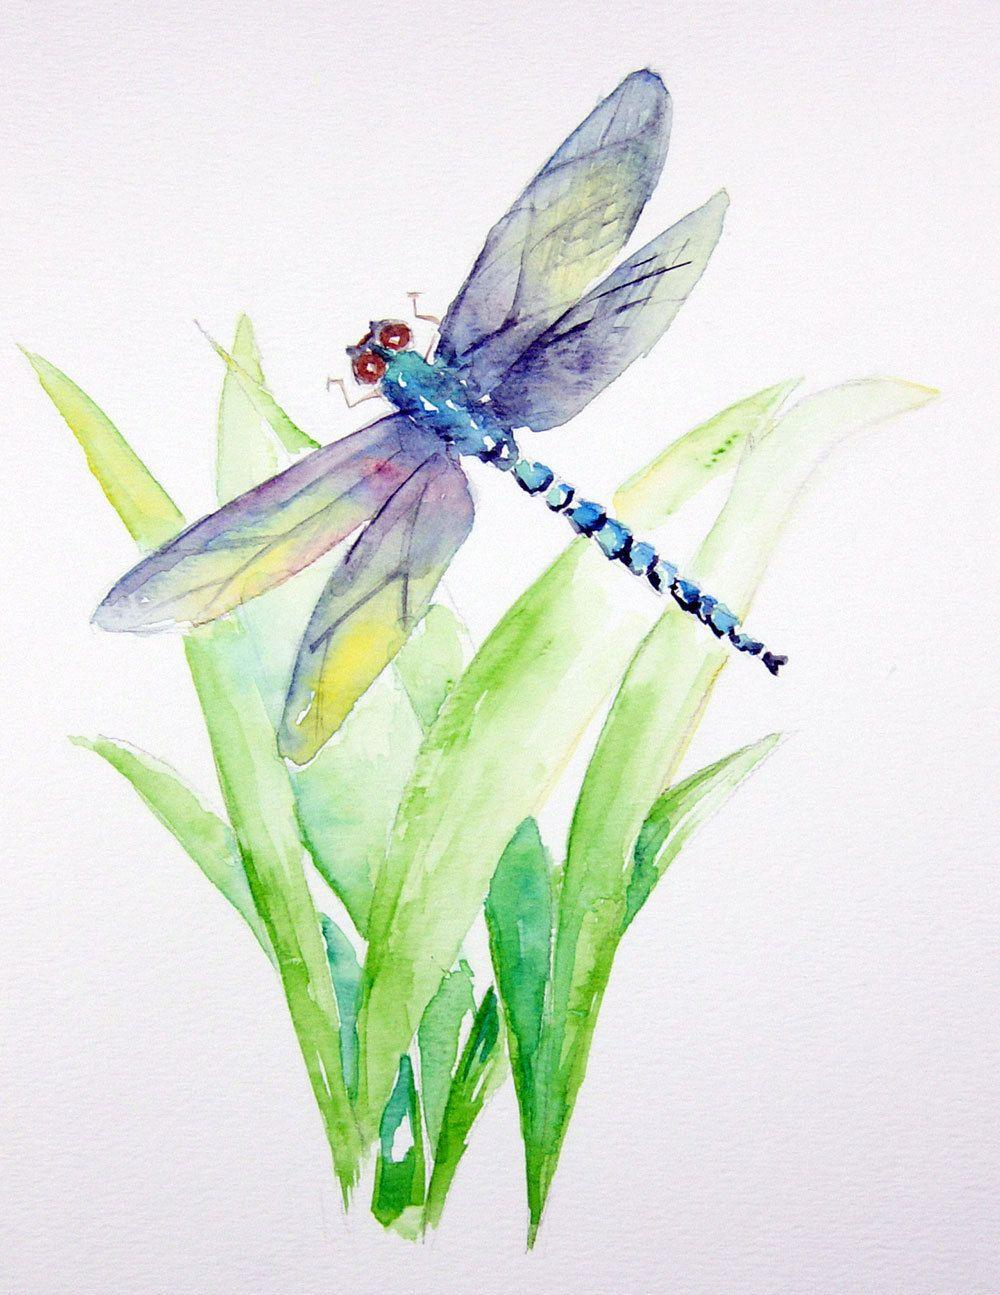 Pintura de libélula por MarilynKJonas en Etsy | acuarelas ...